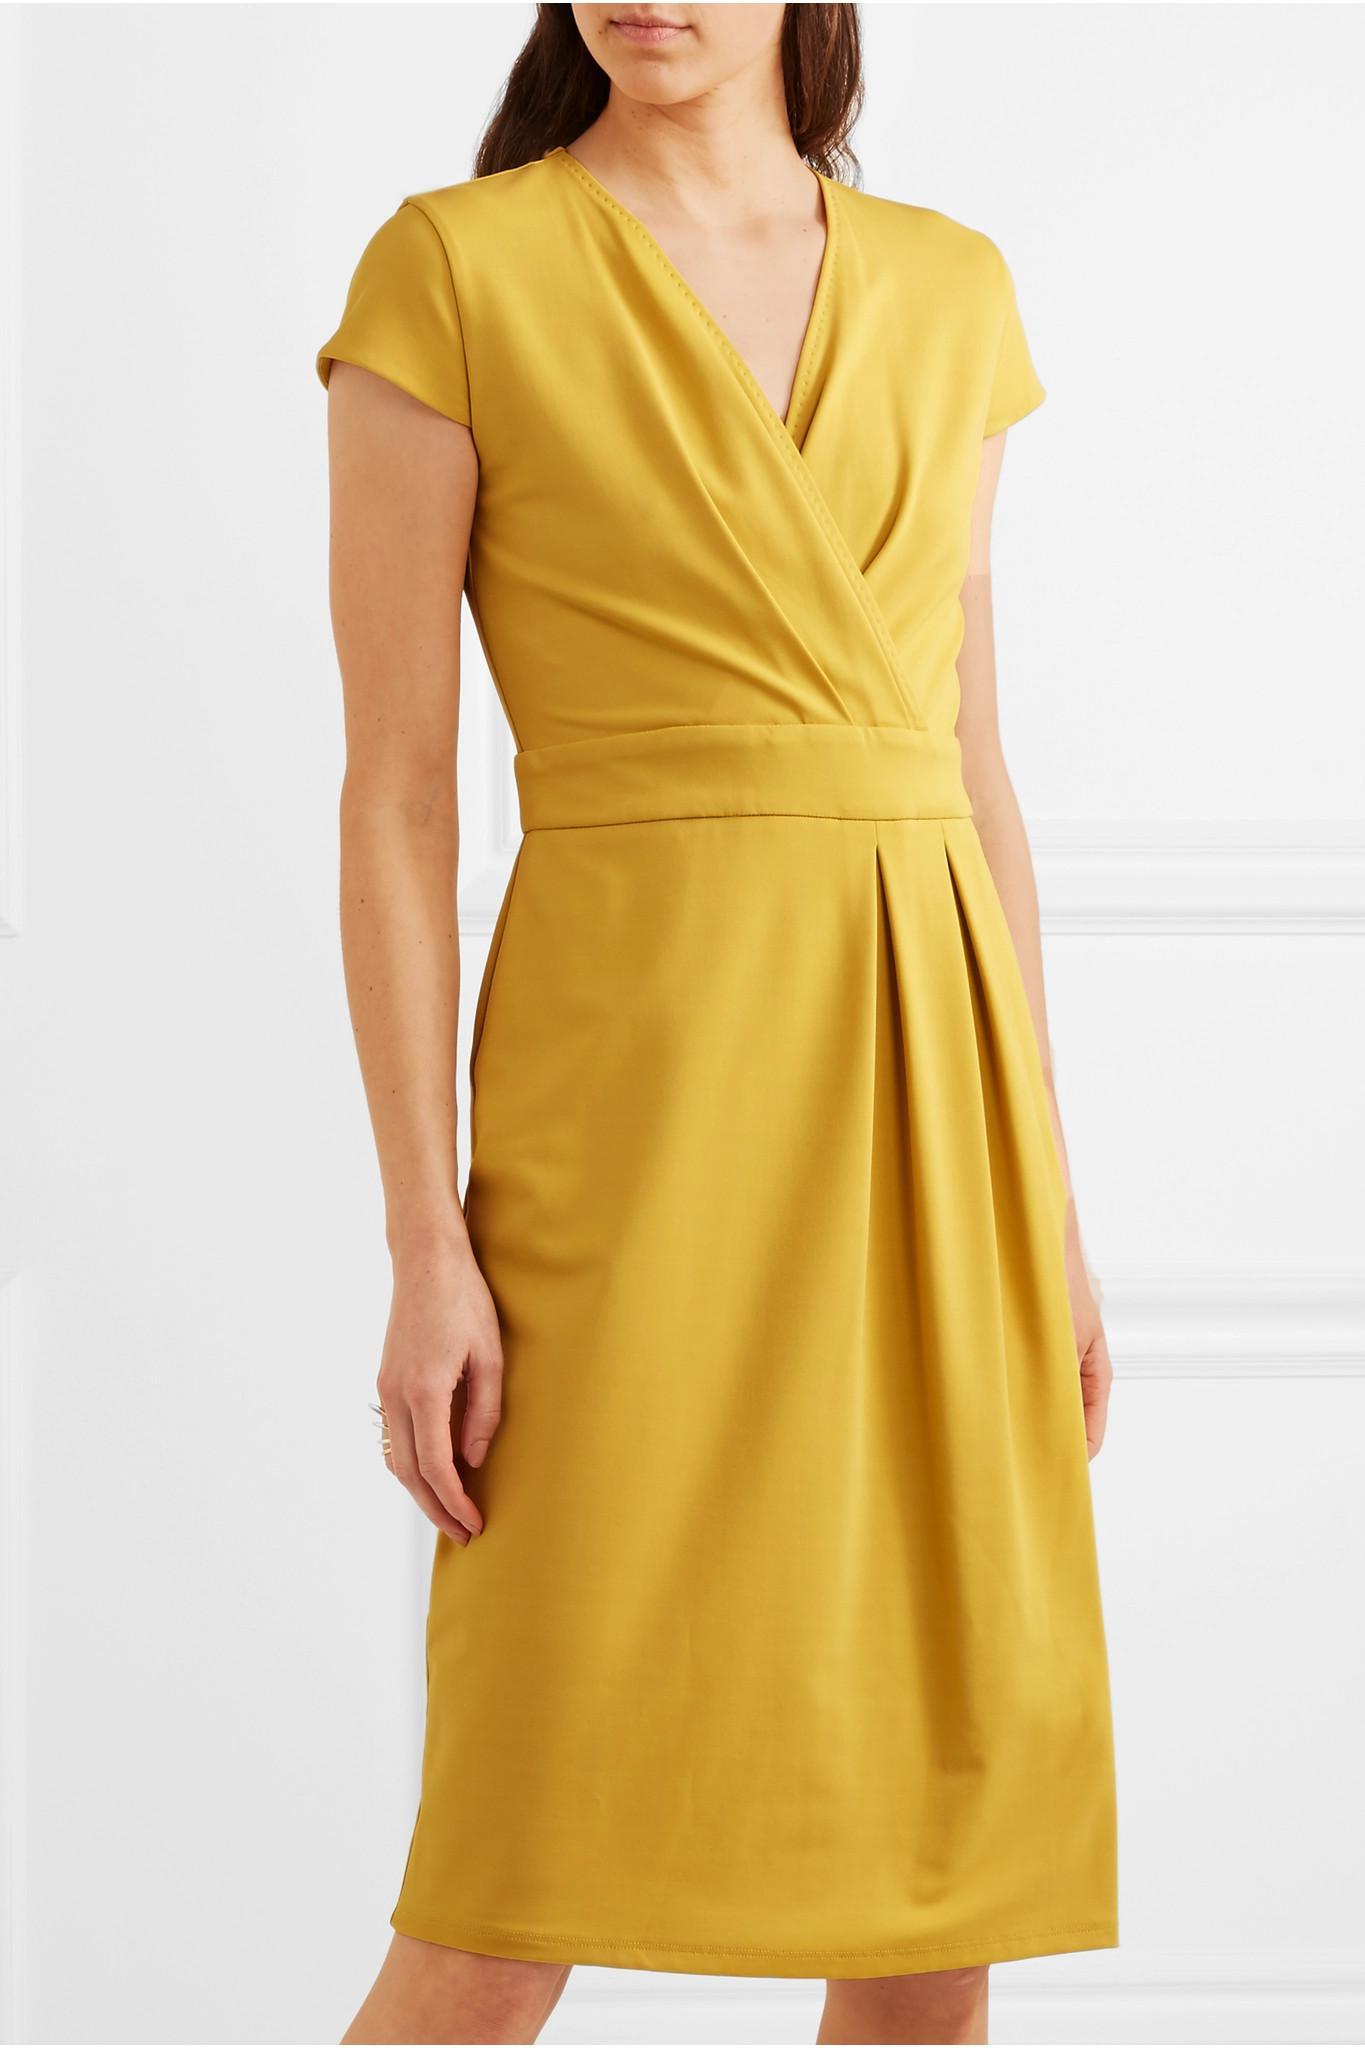 Wrap-effect Stretch-jersey Dress - Yellow Max Mara pFnS51KE